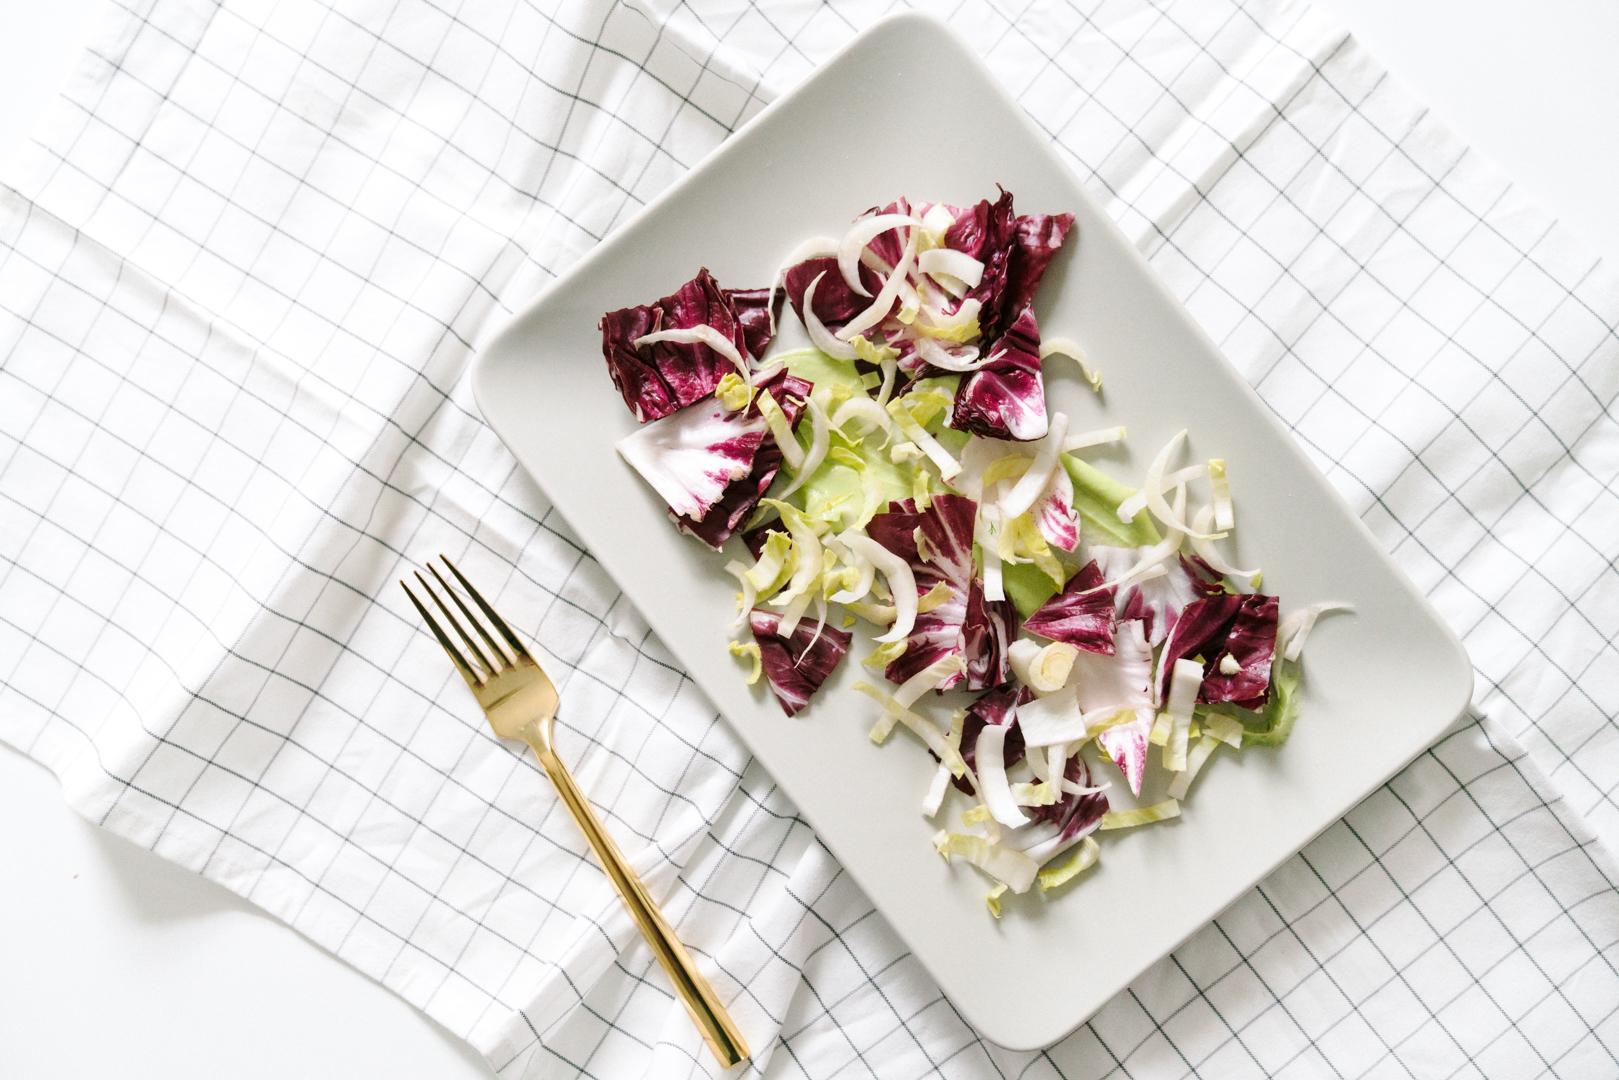 winter bitter greens salad with avocado cream dressing